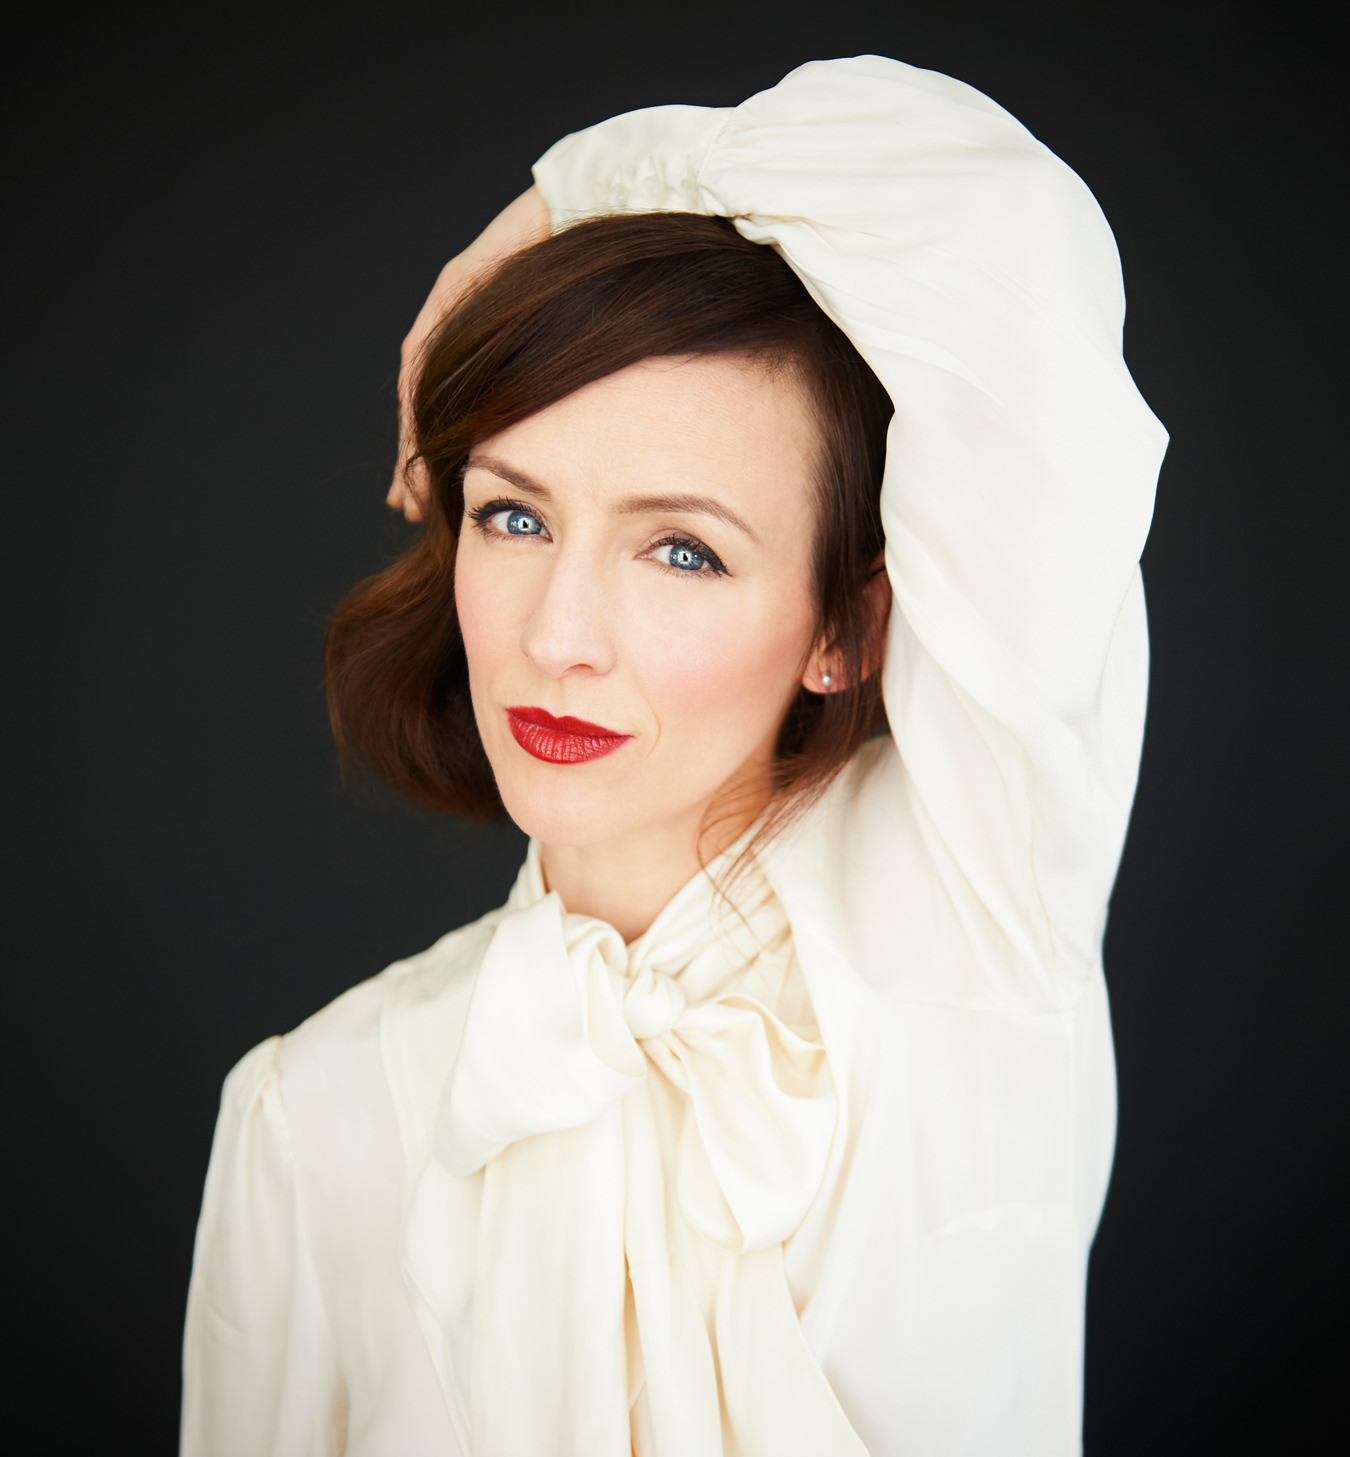 Sarah Slean, FYI Music, Summer 2017